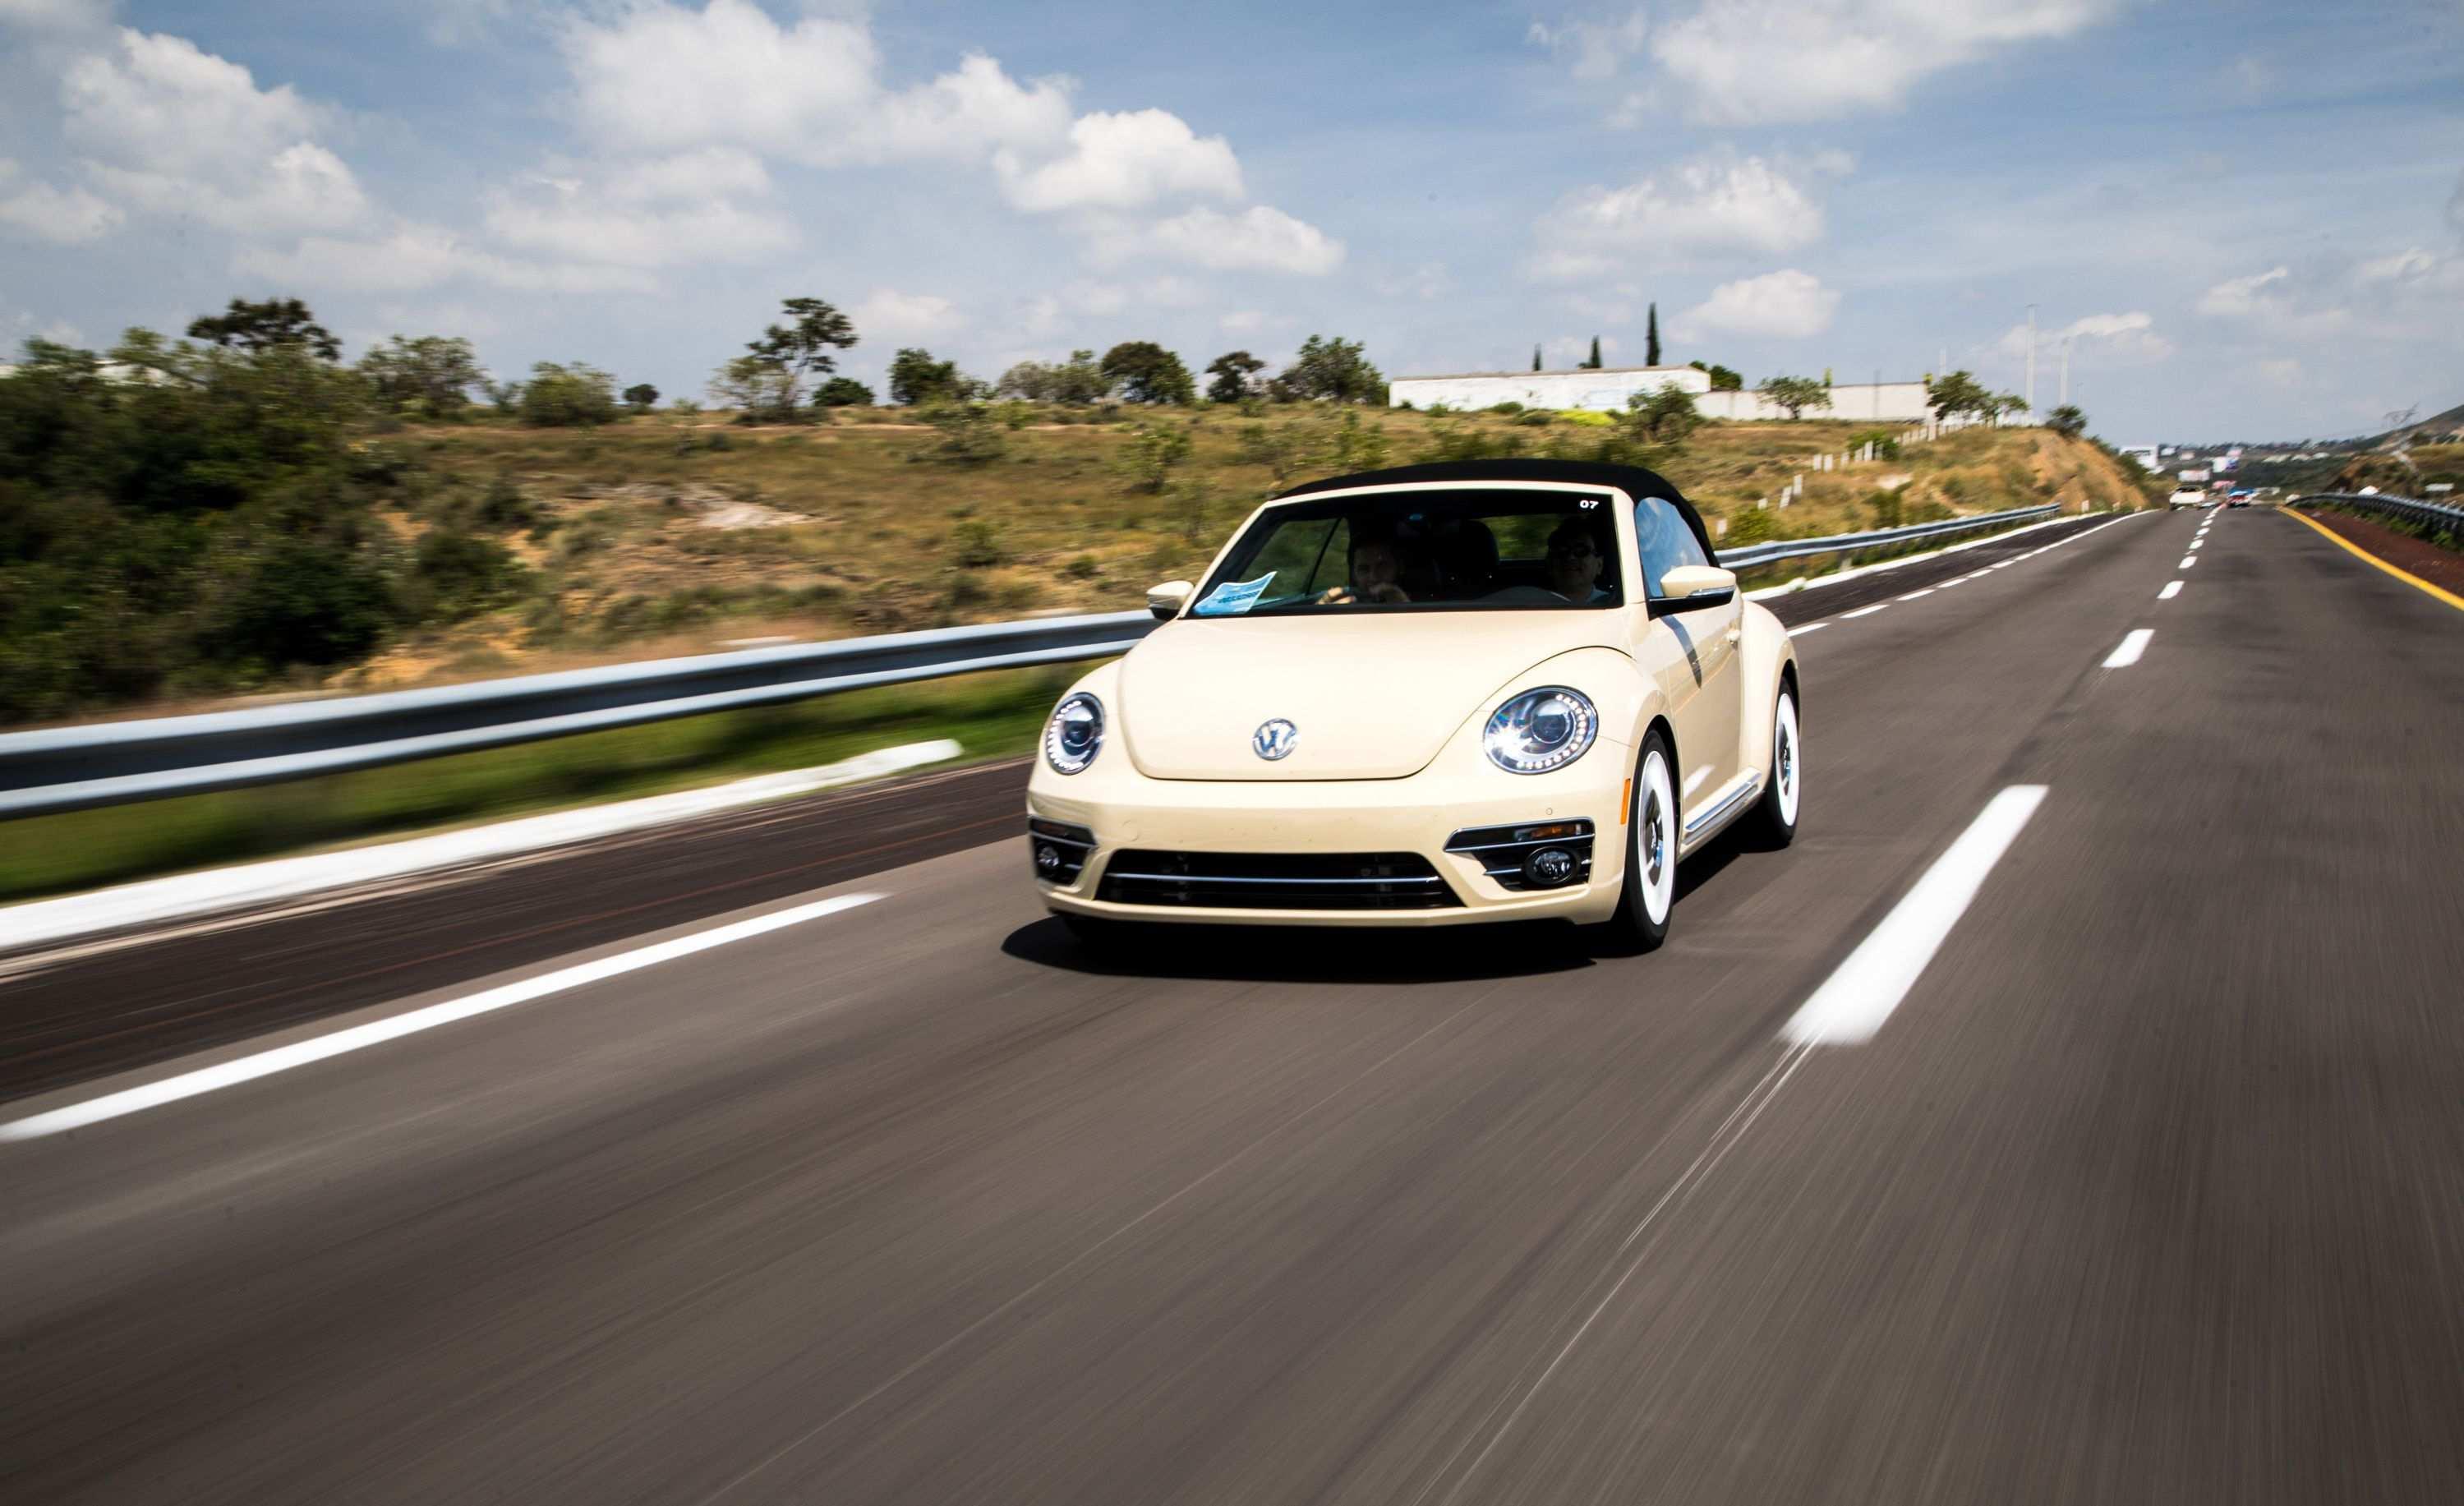 44 All New 2019 Volkswagen Bug Prices with 2019 Volkswagen Bug